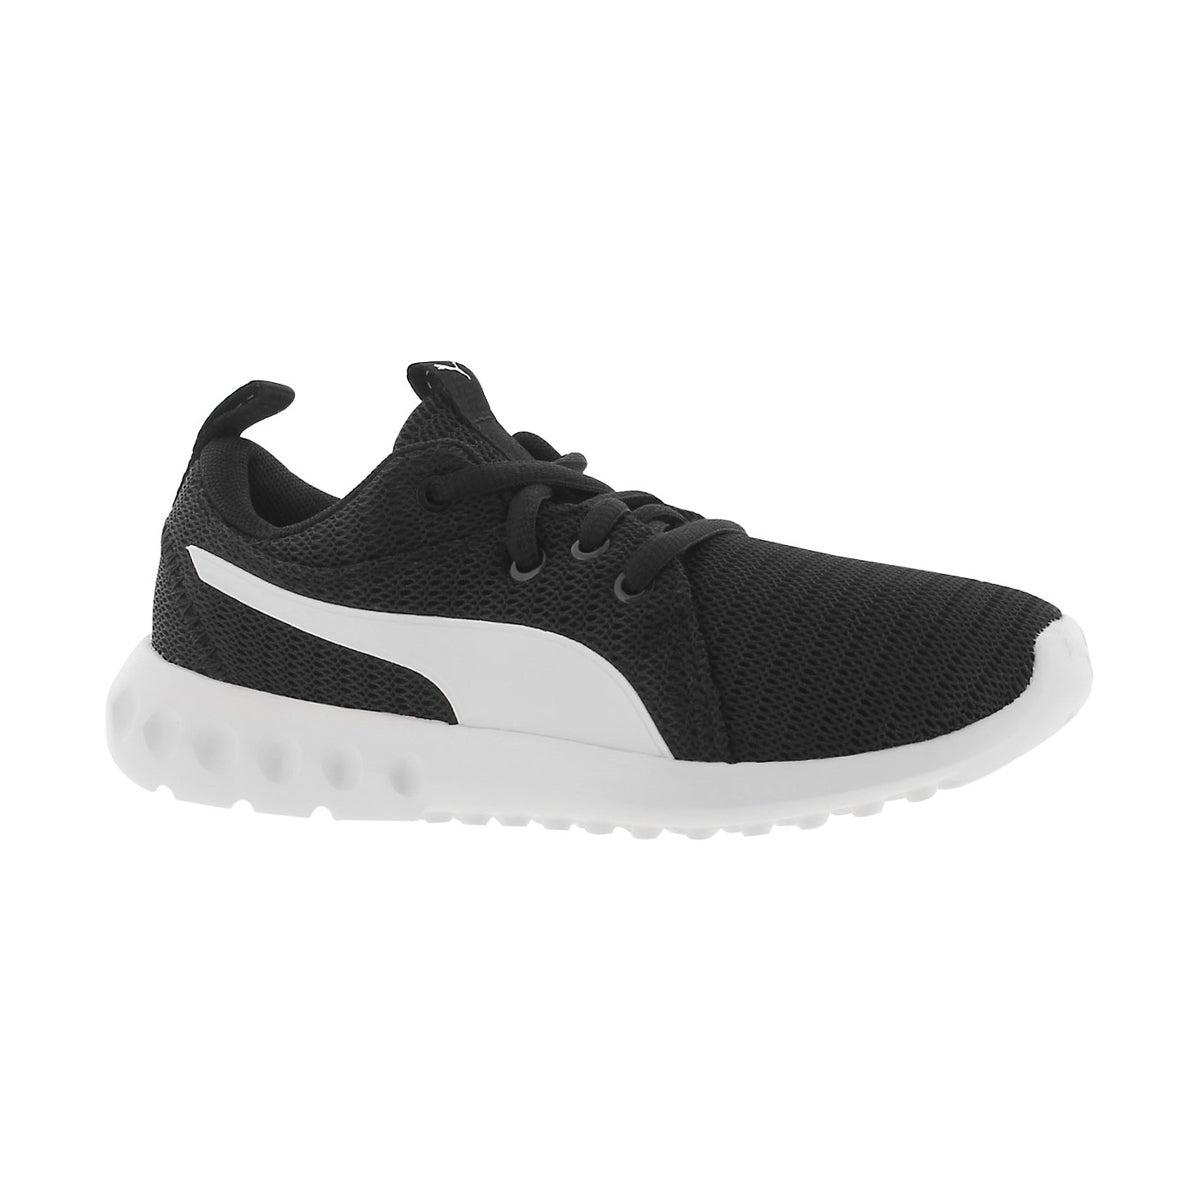 Boys' CARSON 2 JR black lace up sneakers